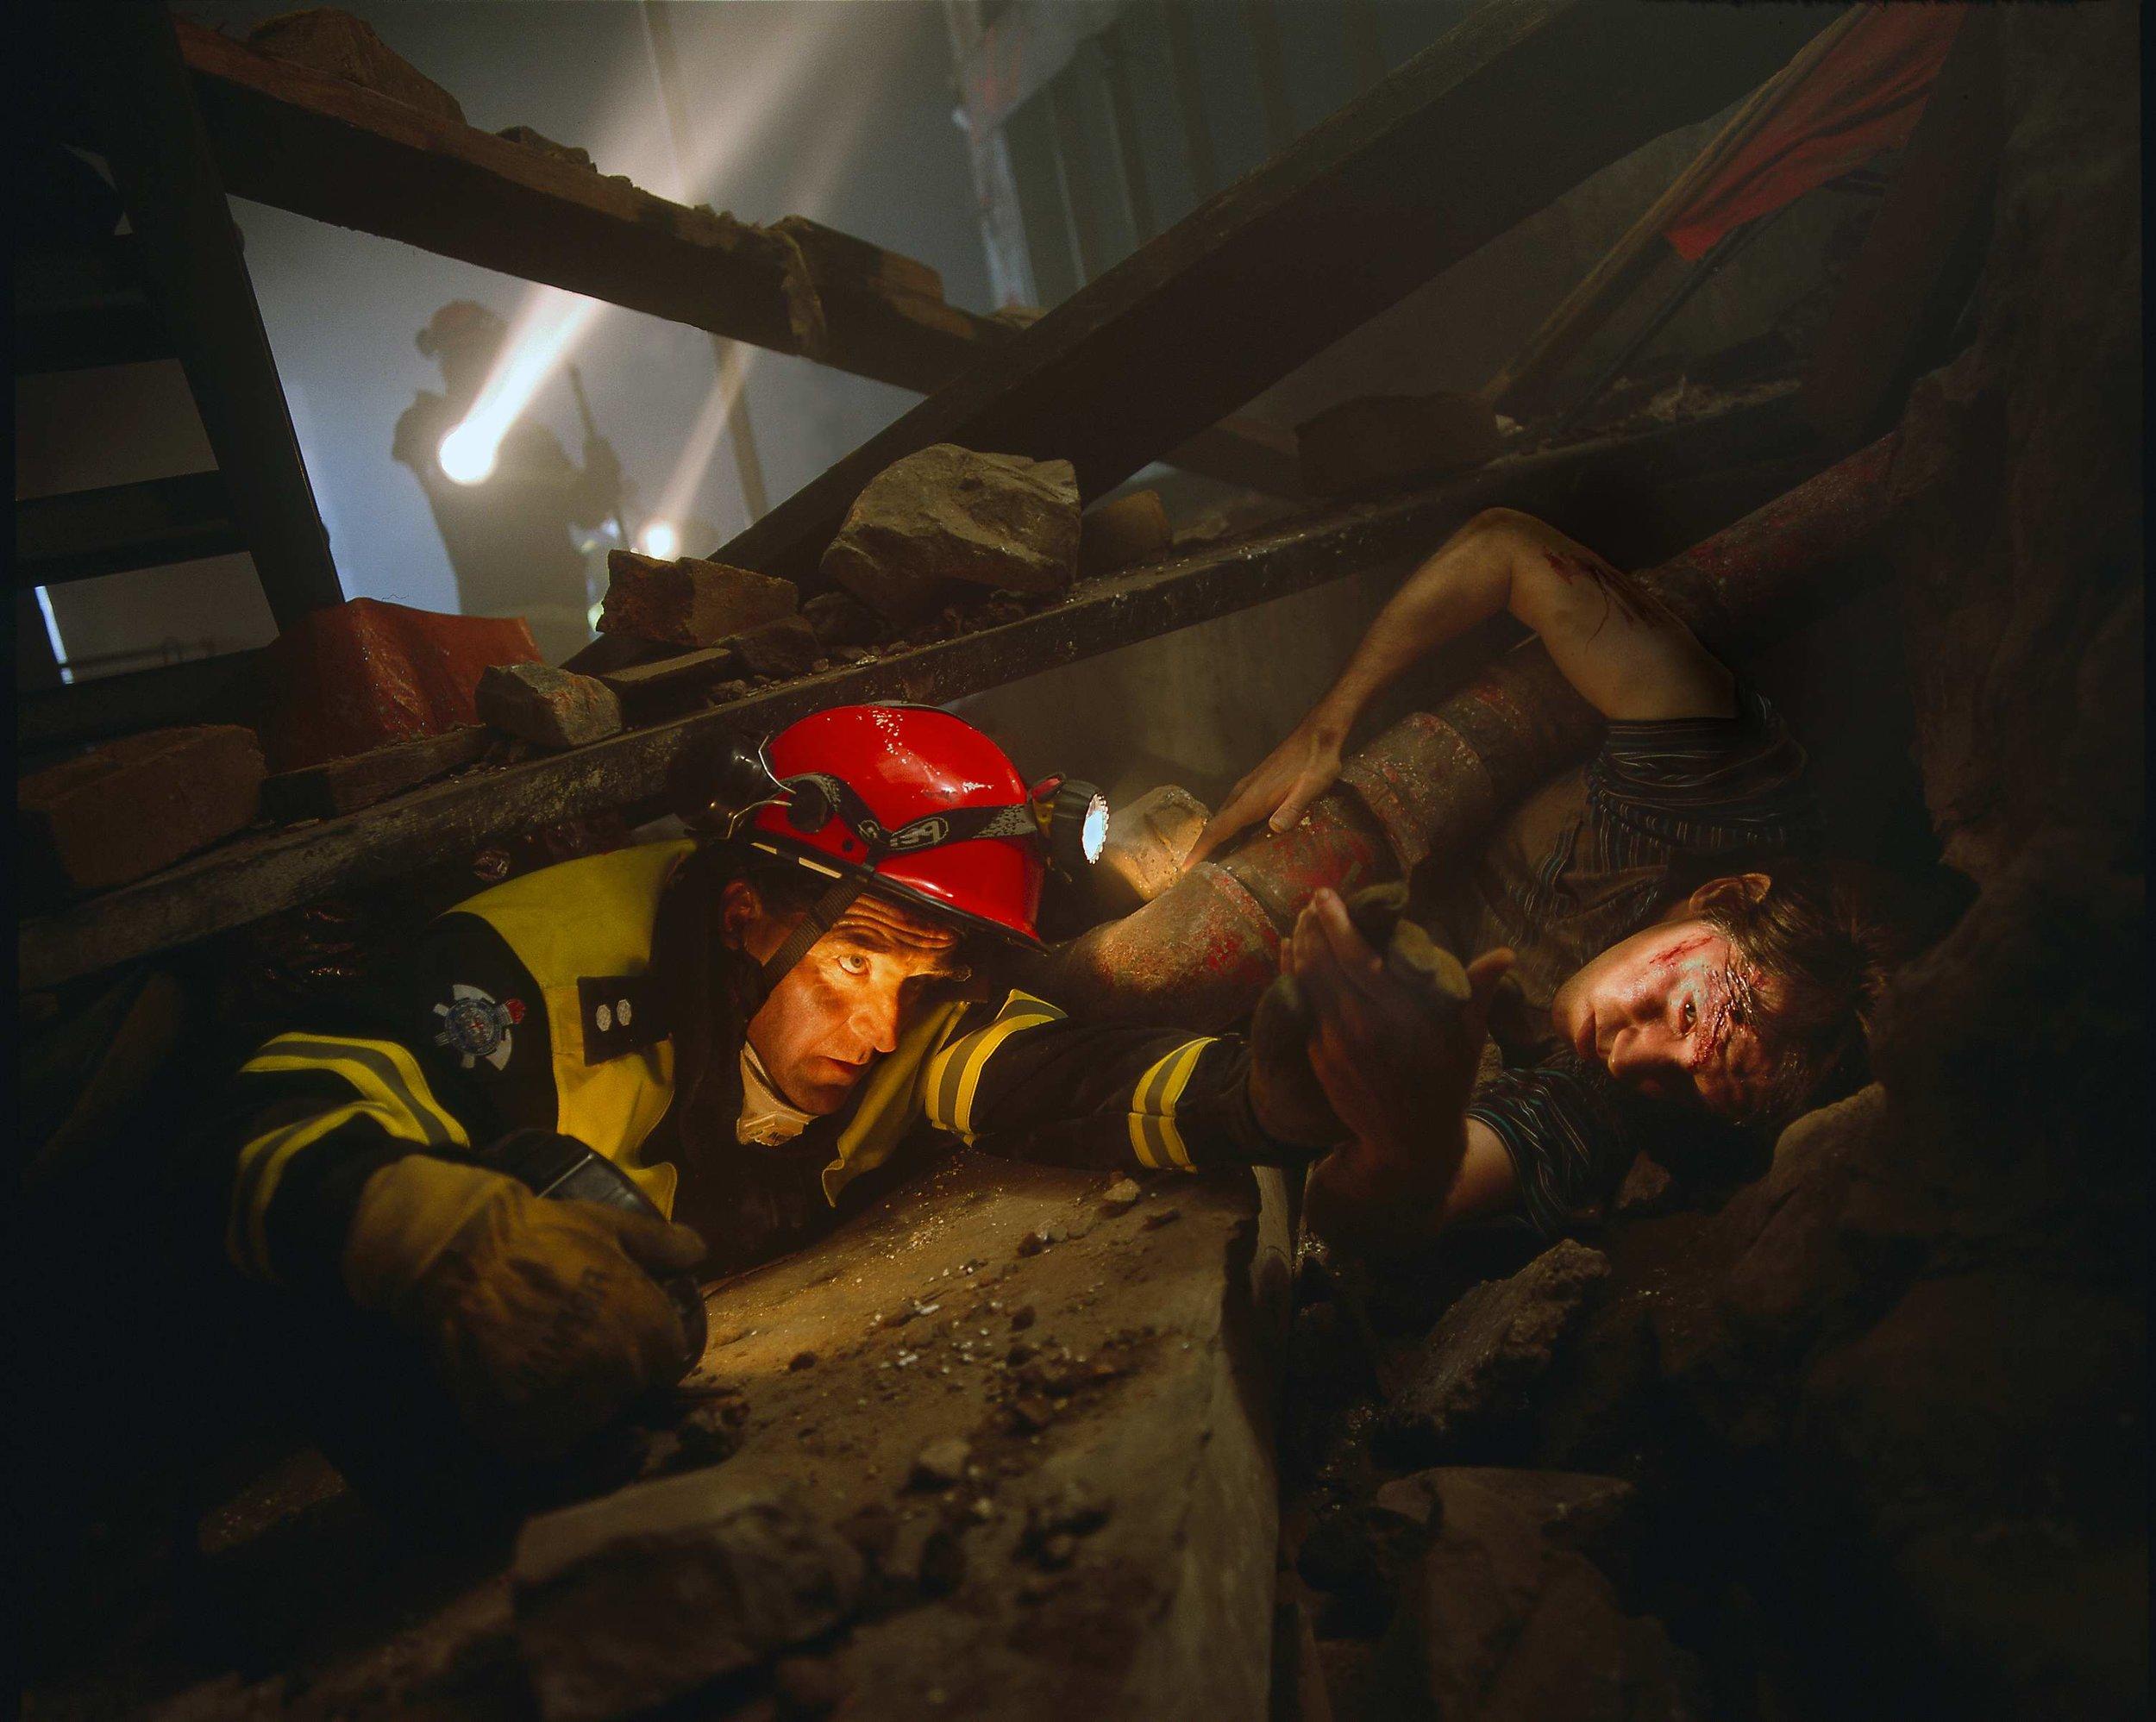 Melbourne Fire Brigade